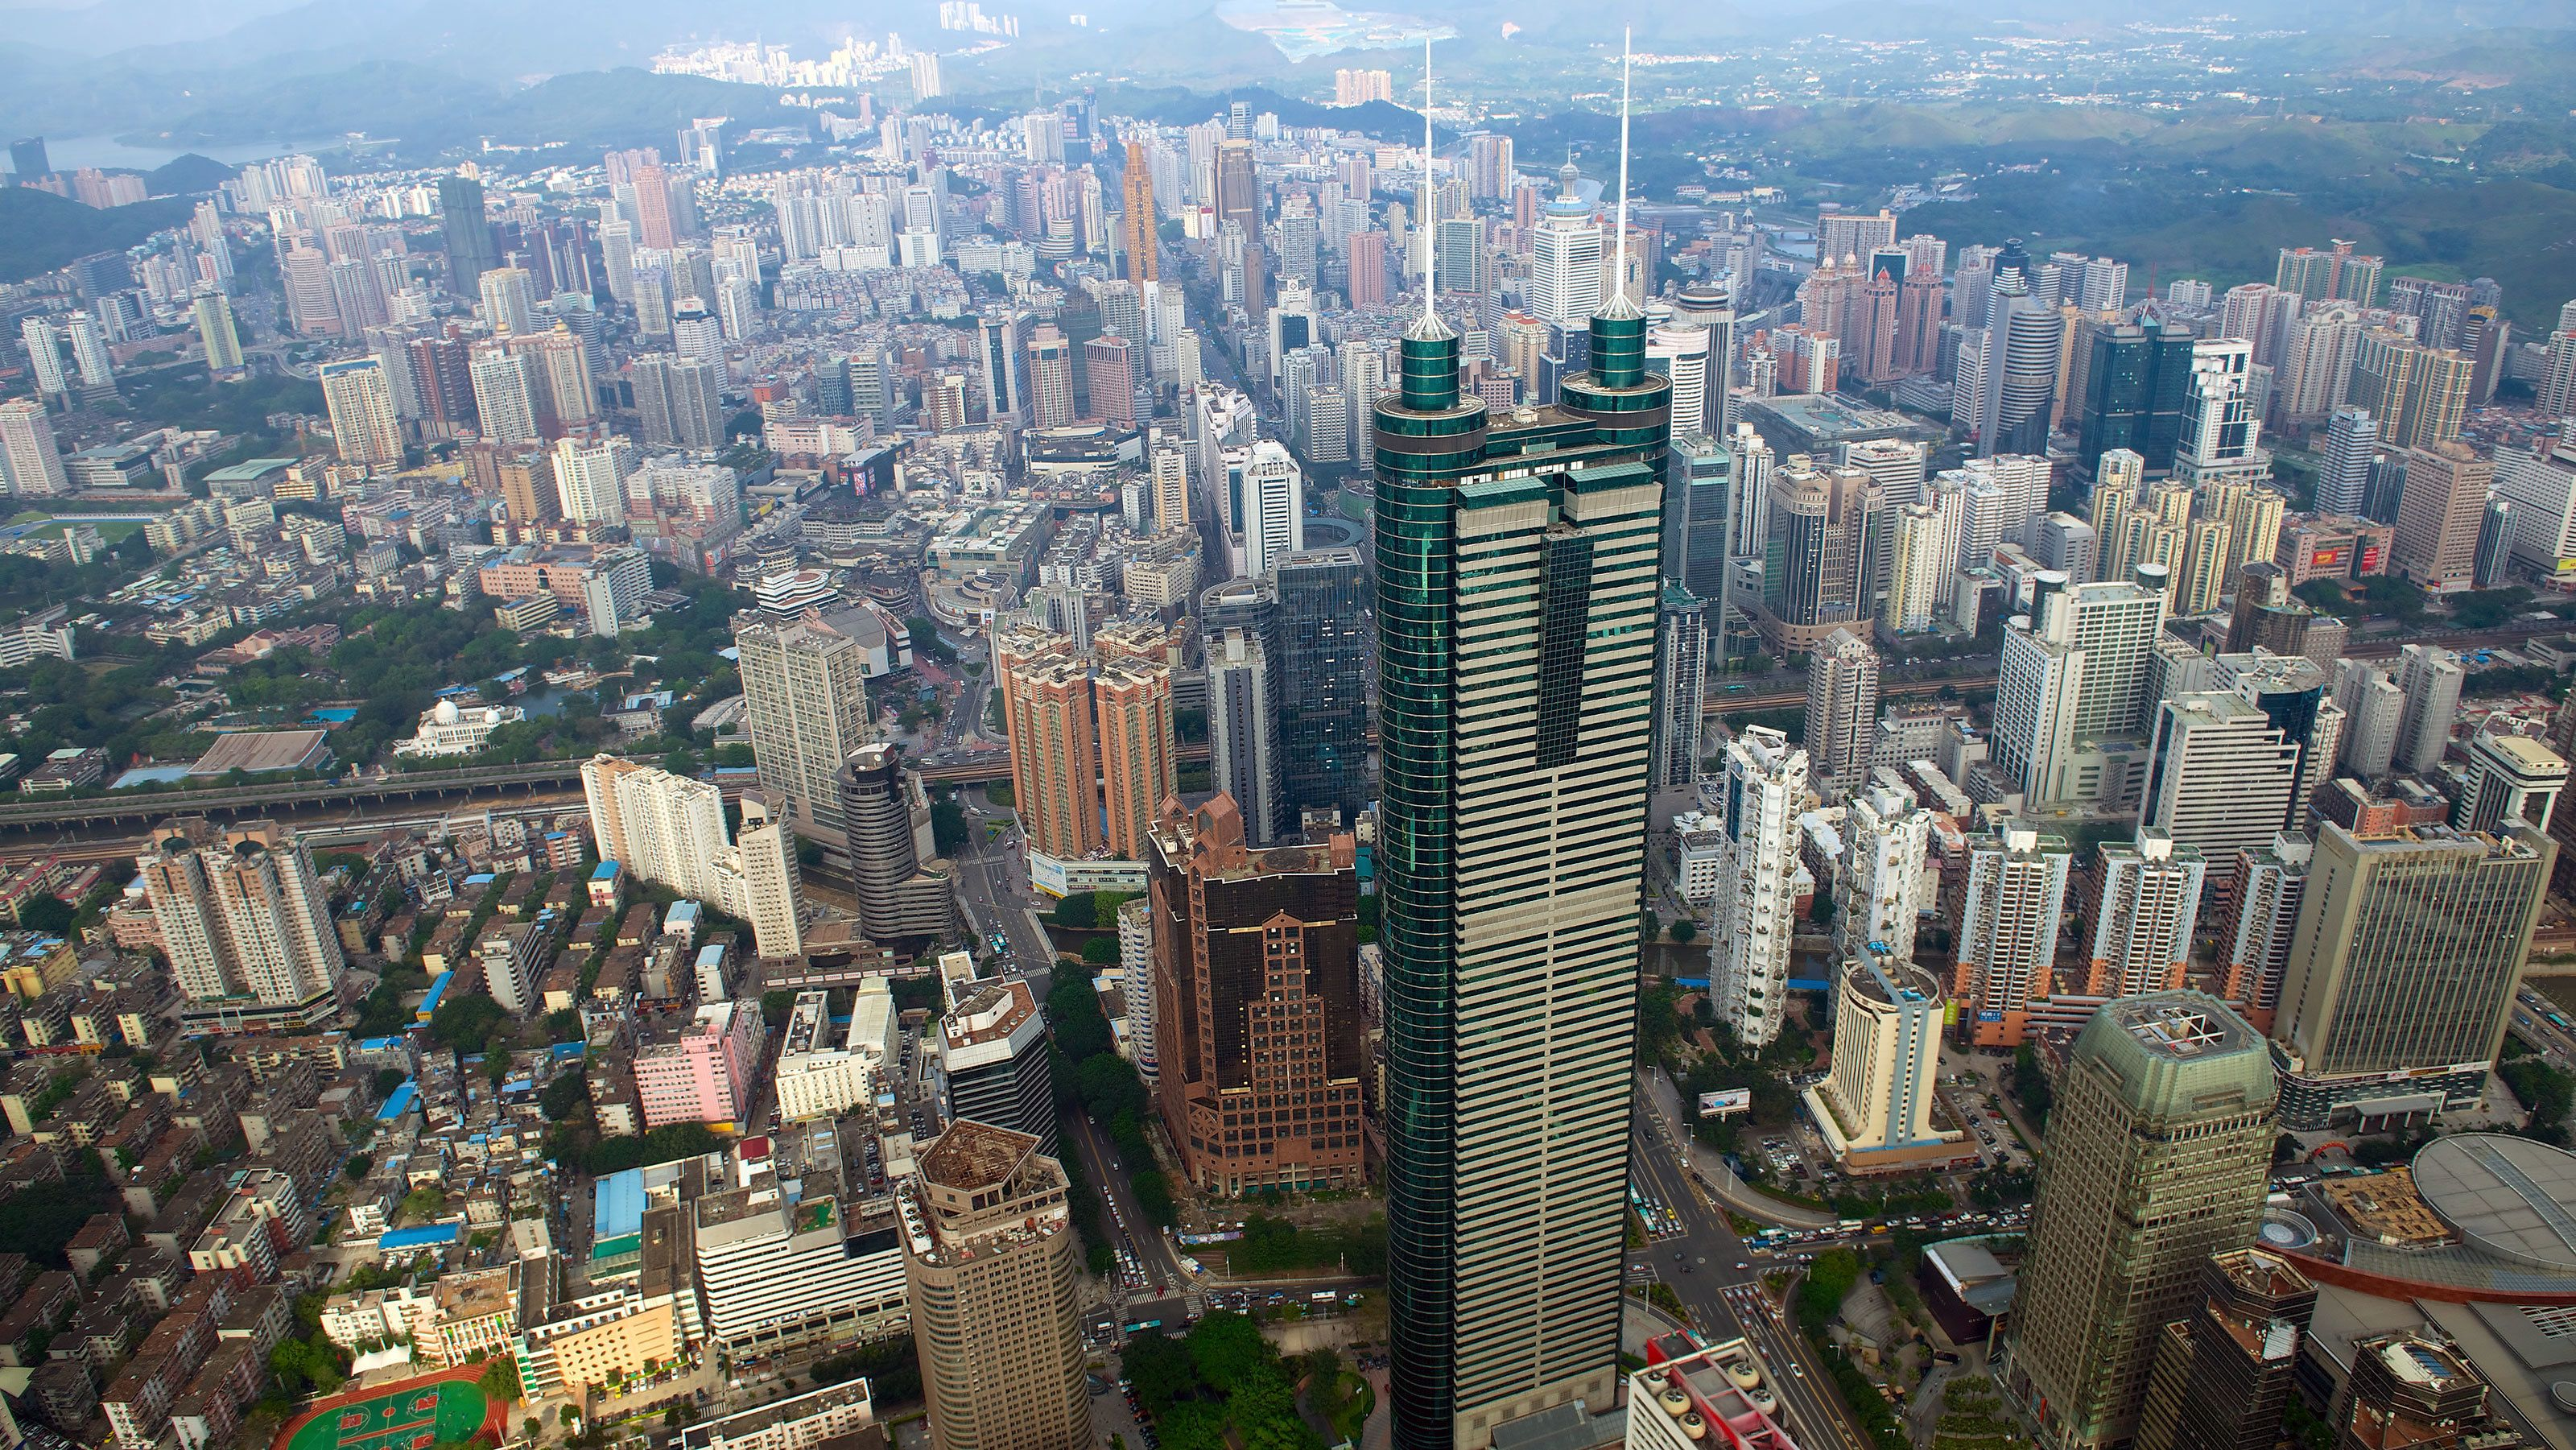 Tall skyscrapers in Hong Kong